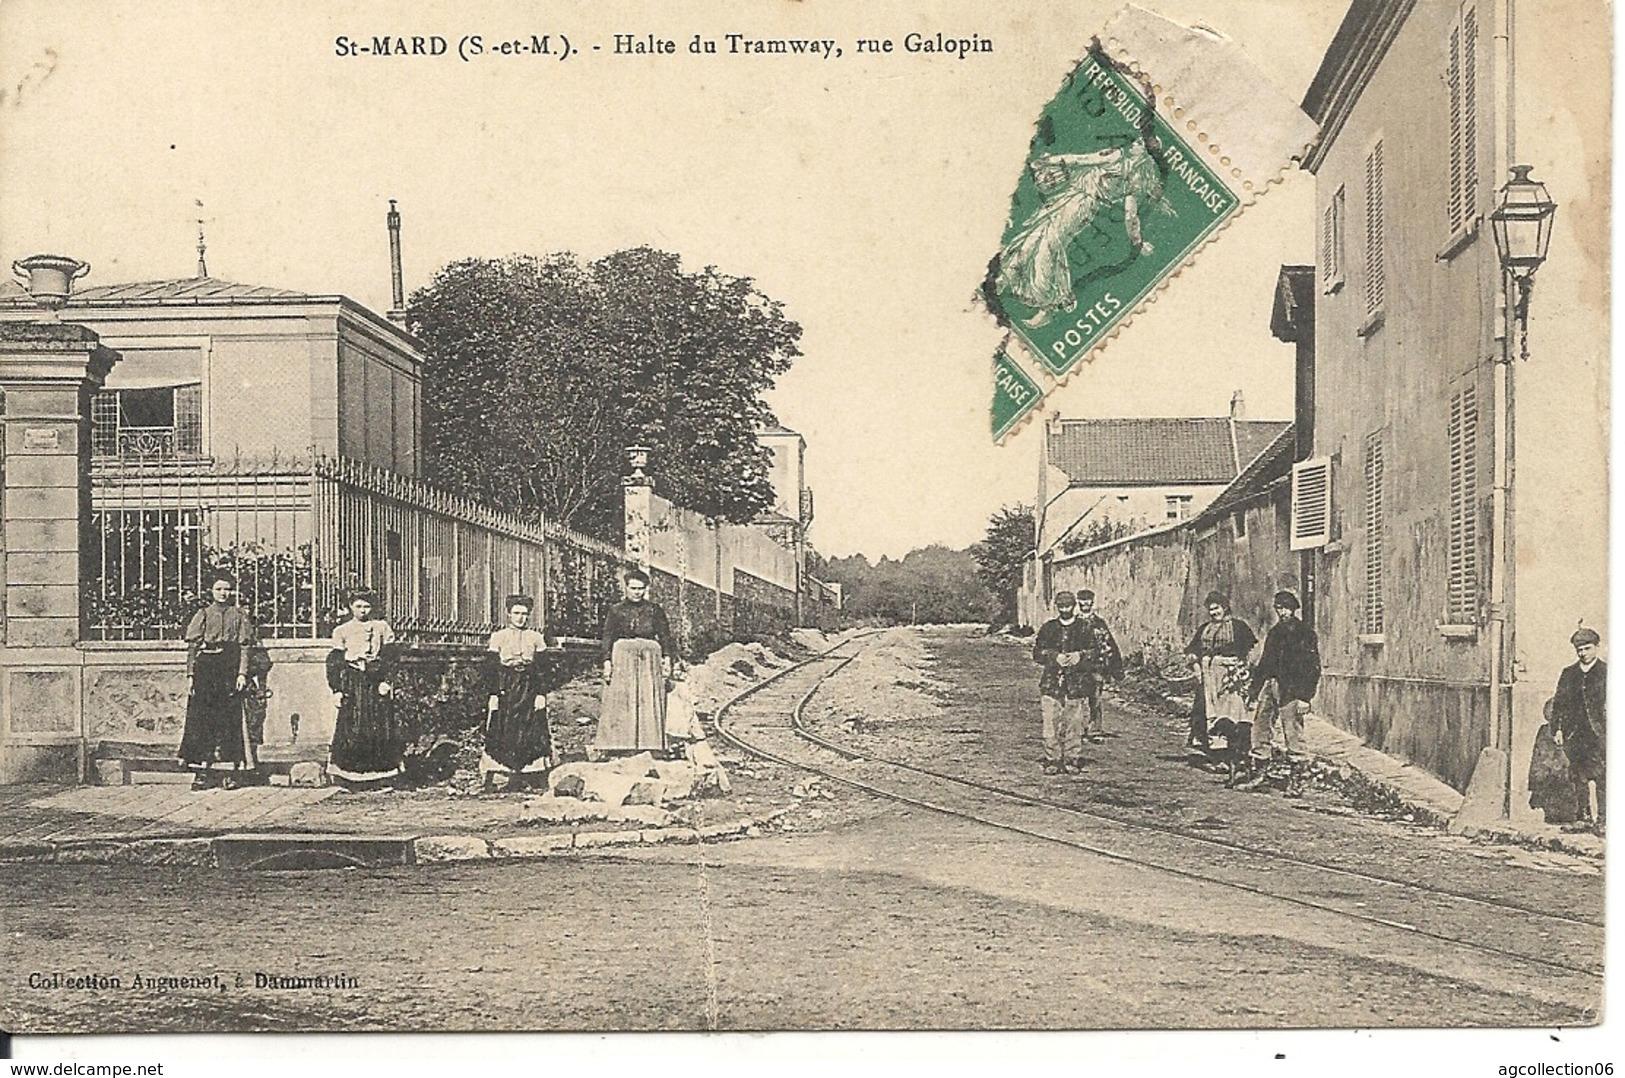 SAINT MARD. HALTE DU TRAMWAY. RUE GALOPIN - France